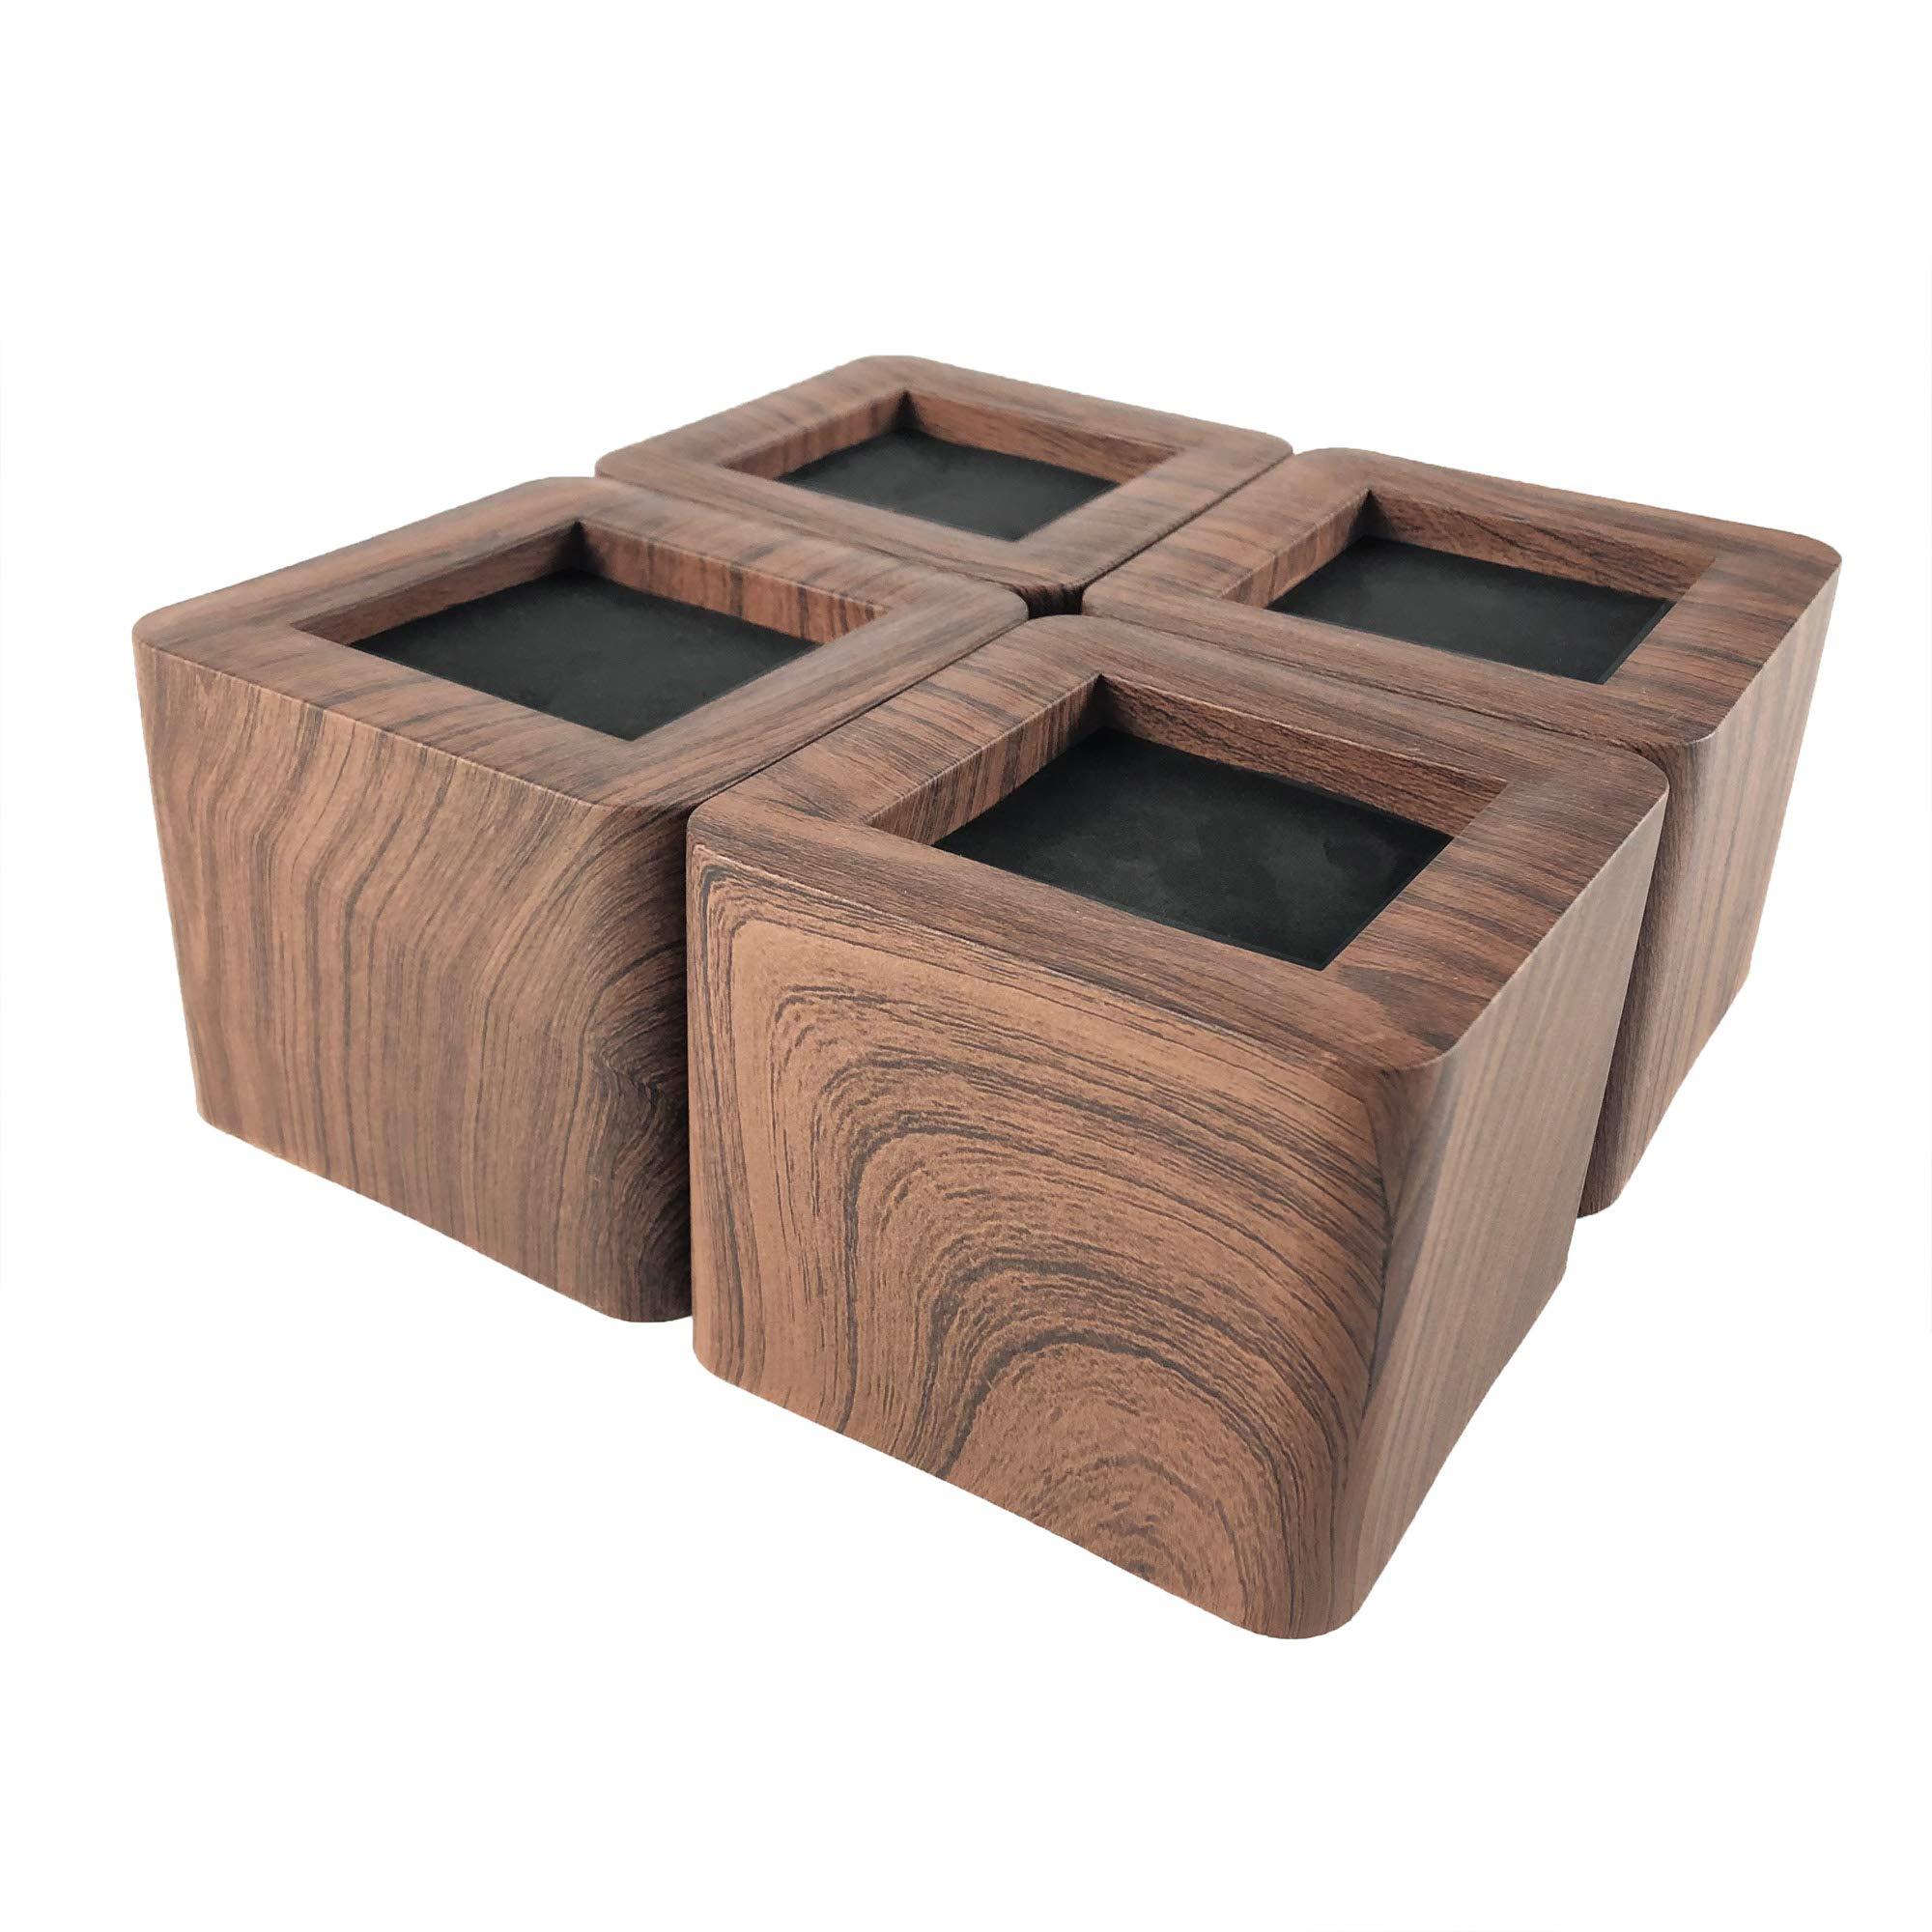 MIIX HOME / Bed Risers 3 Inch | Heavy Duty Wood Color Furniture Riser | 4PCS | Dark Brown Sofa Risers or Table Risers (Dark Wood Colour)